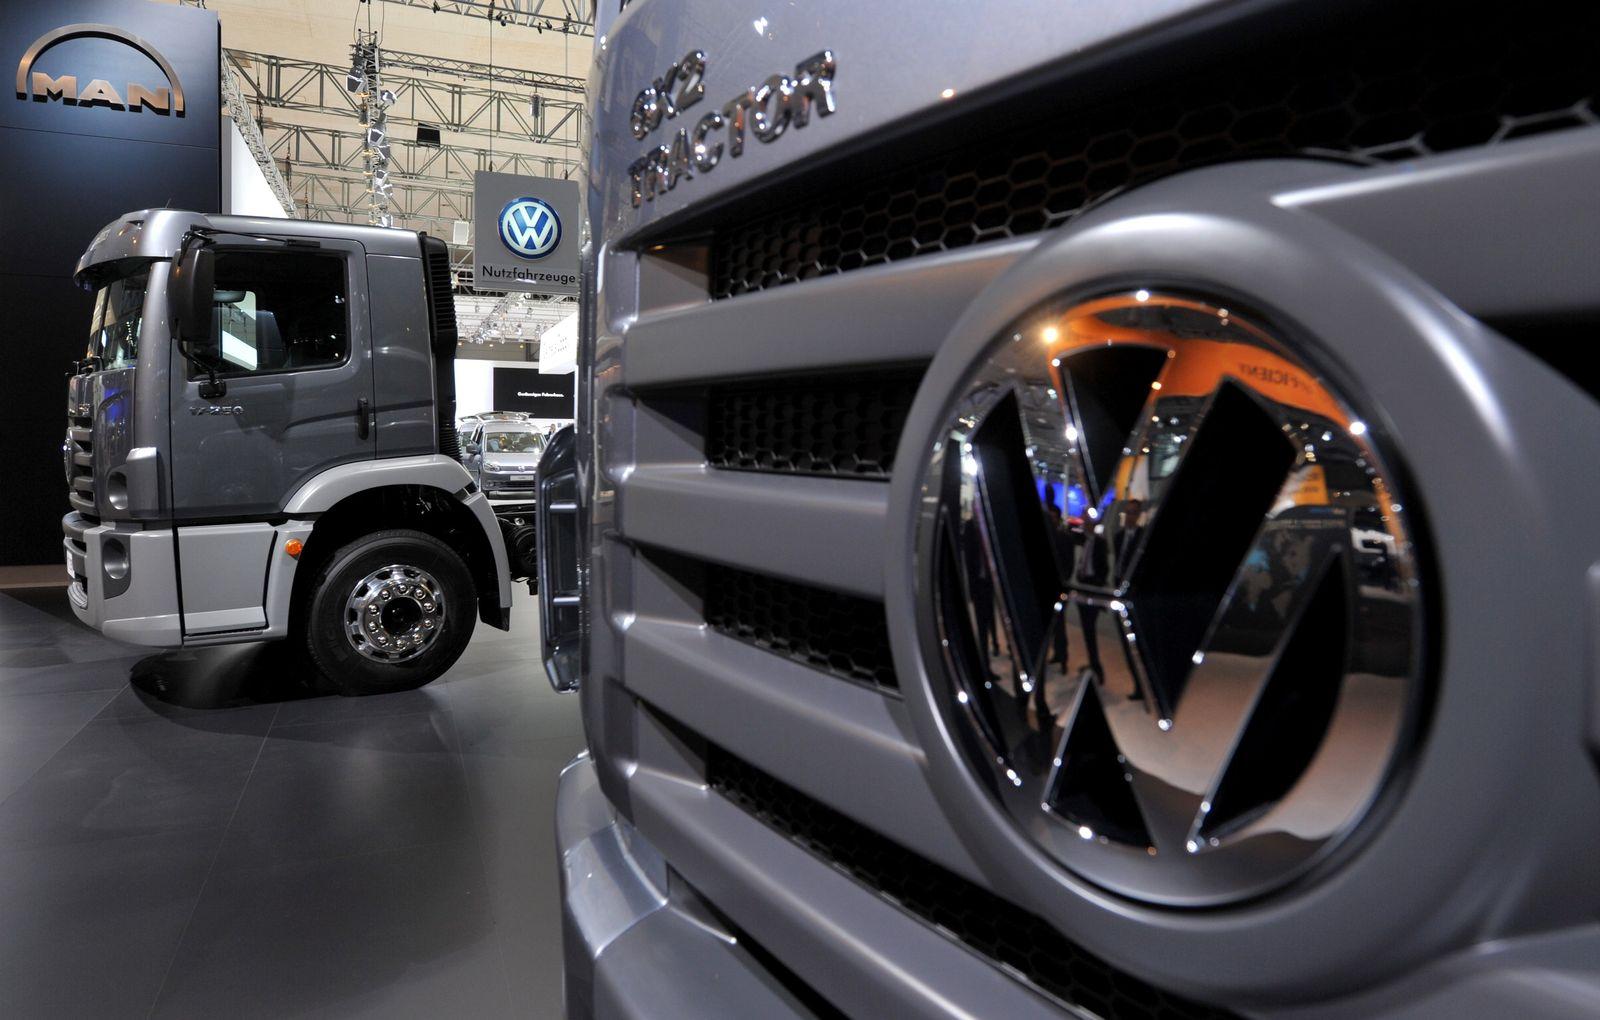 IAA Nutzfahrzeuge 2010 / VW / MAN / LKW